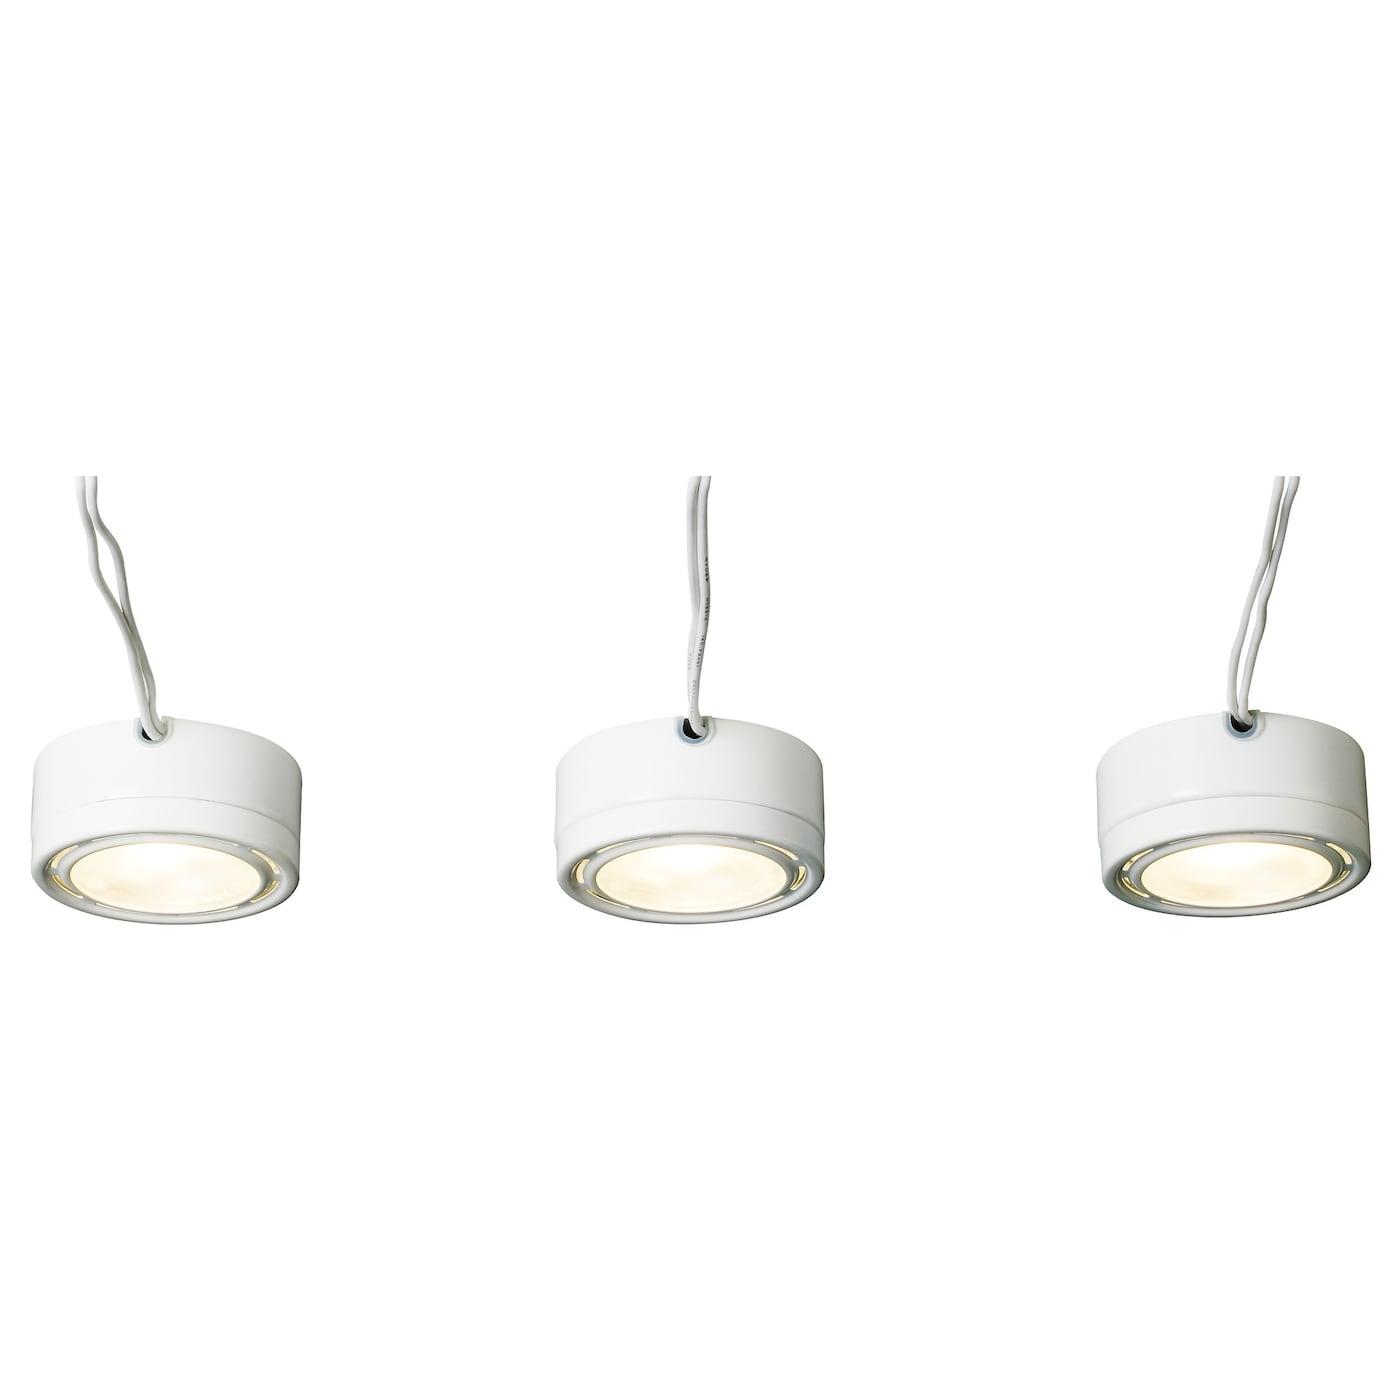 Ikea Katalog 2016 Osvětlen 237 Do Kuchyně Katalog 2016 N 225 Bytek Online 4